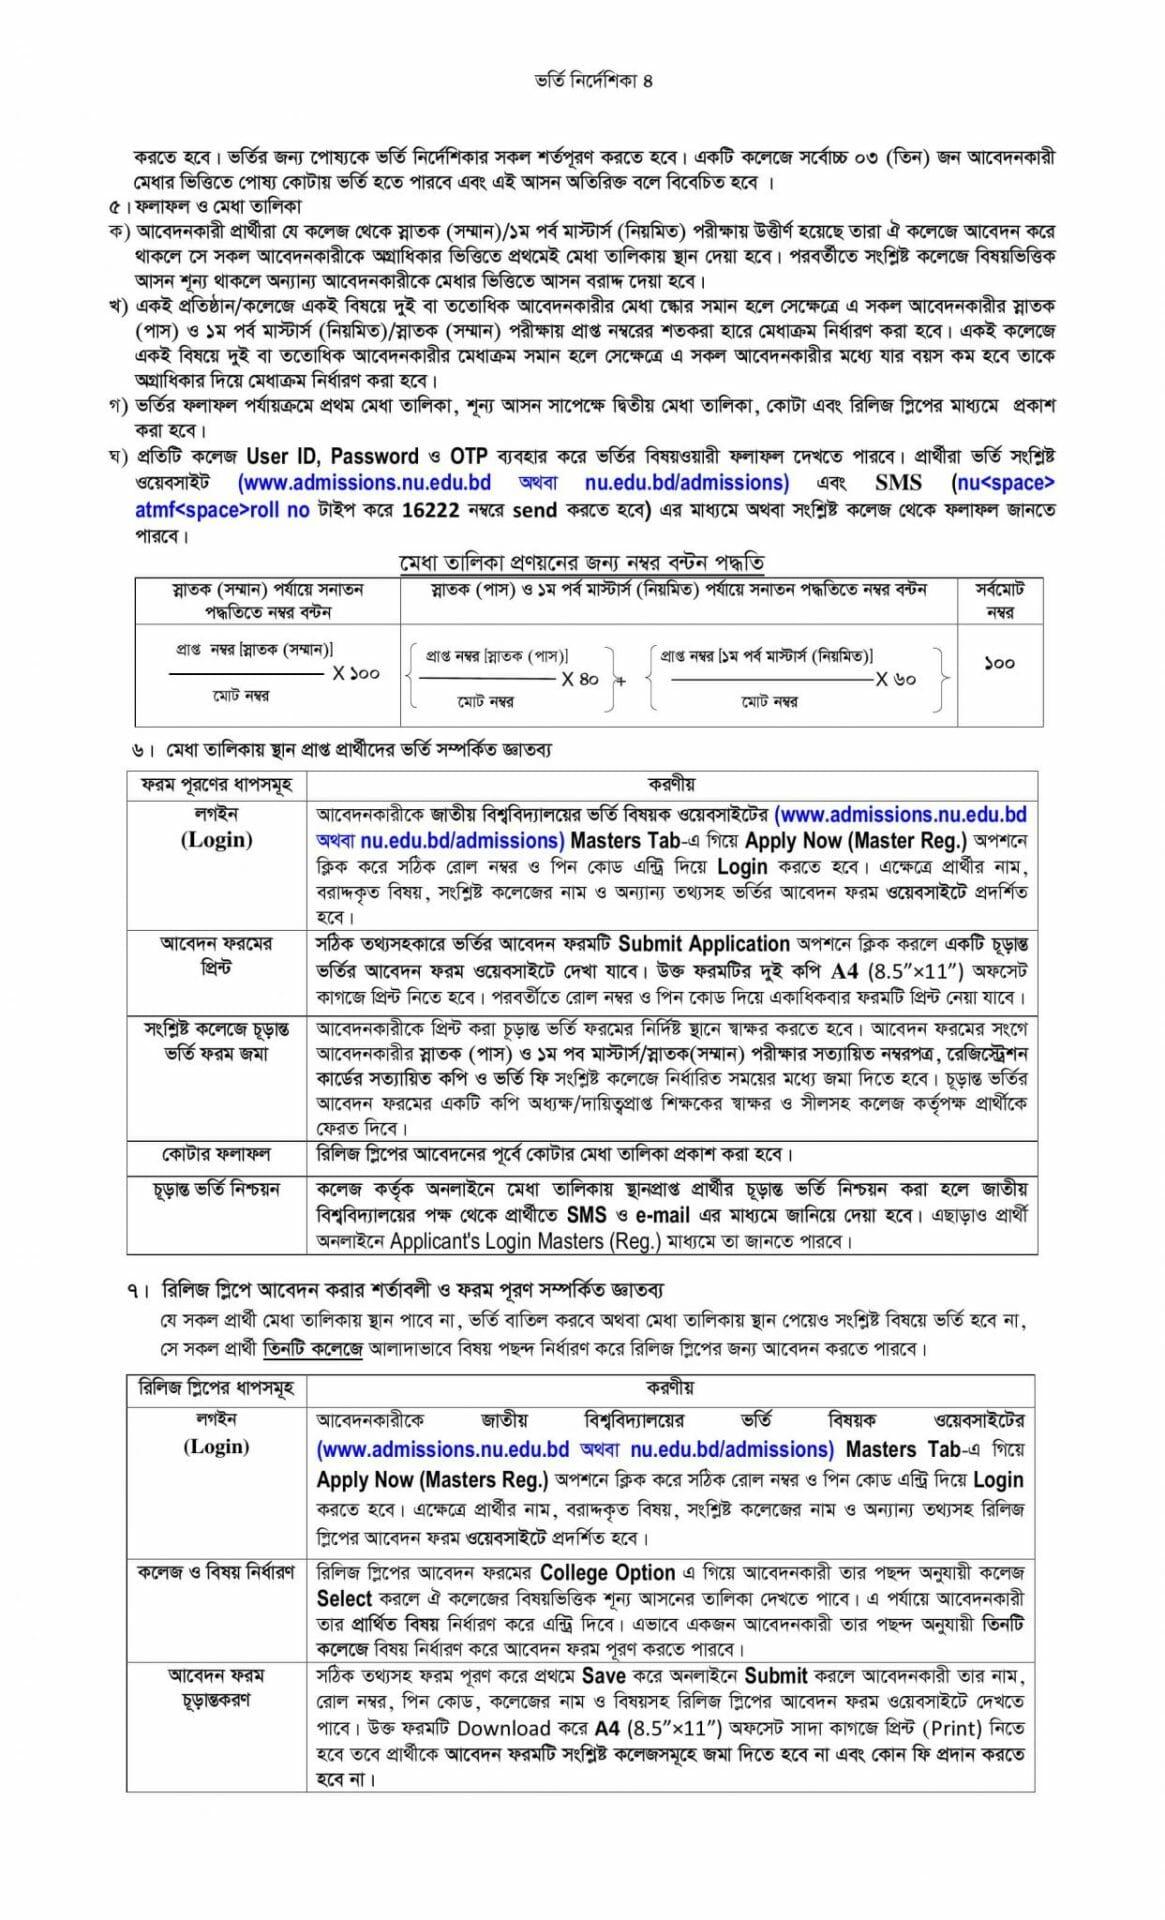 National University Admission Masters Regular guideline-3